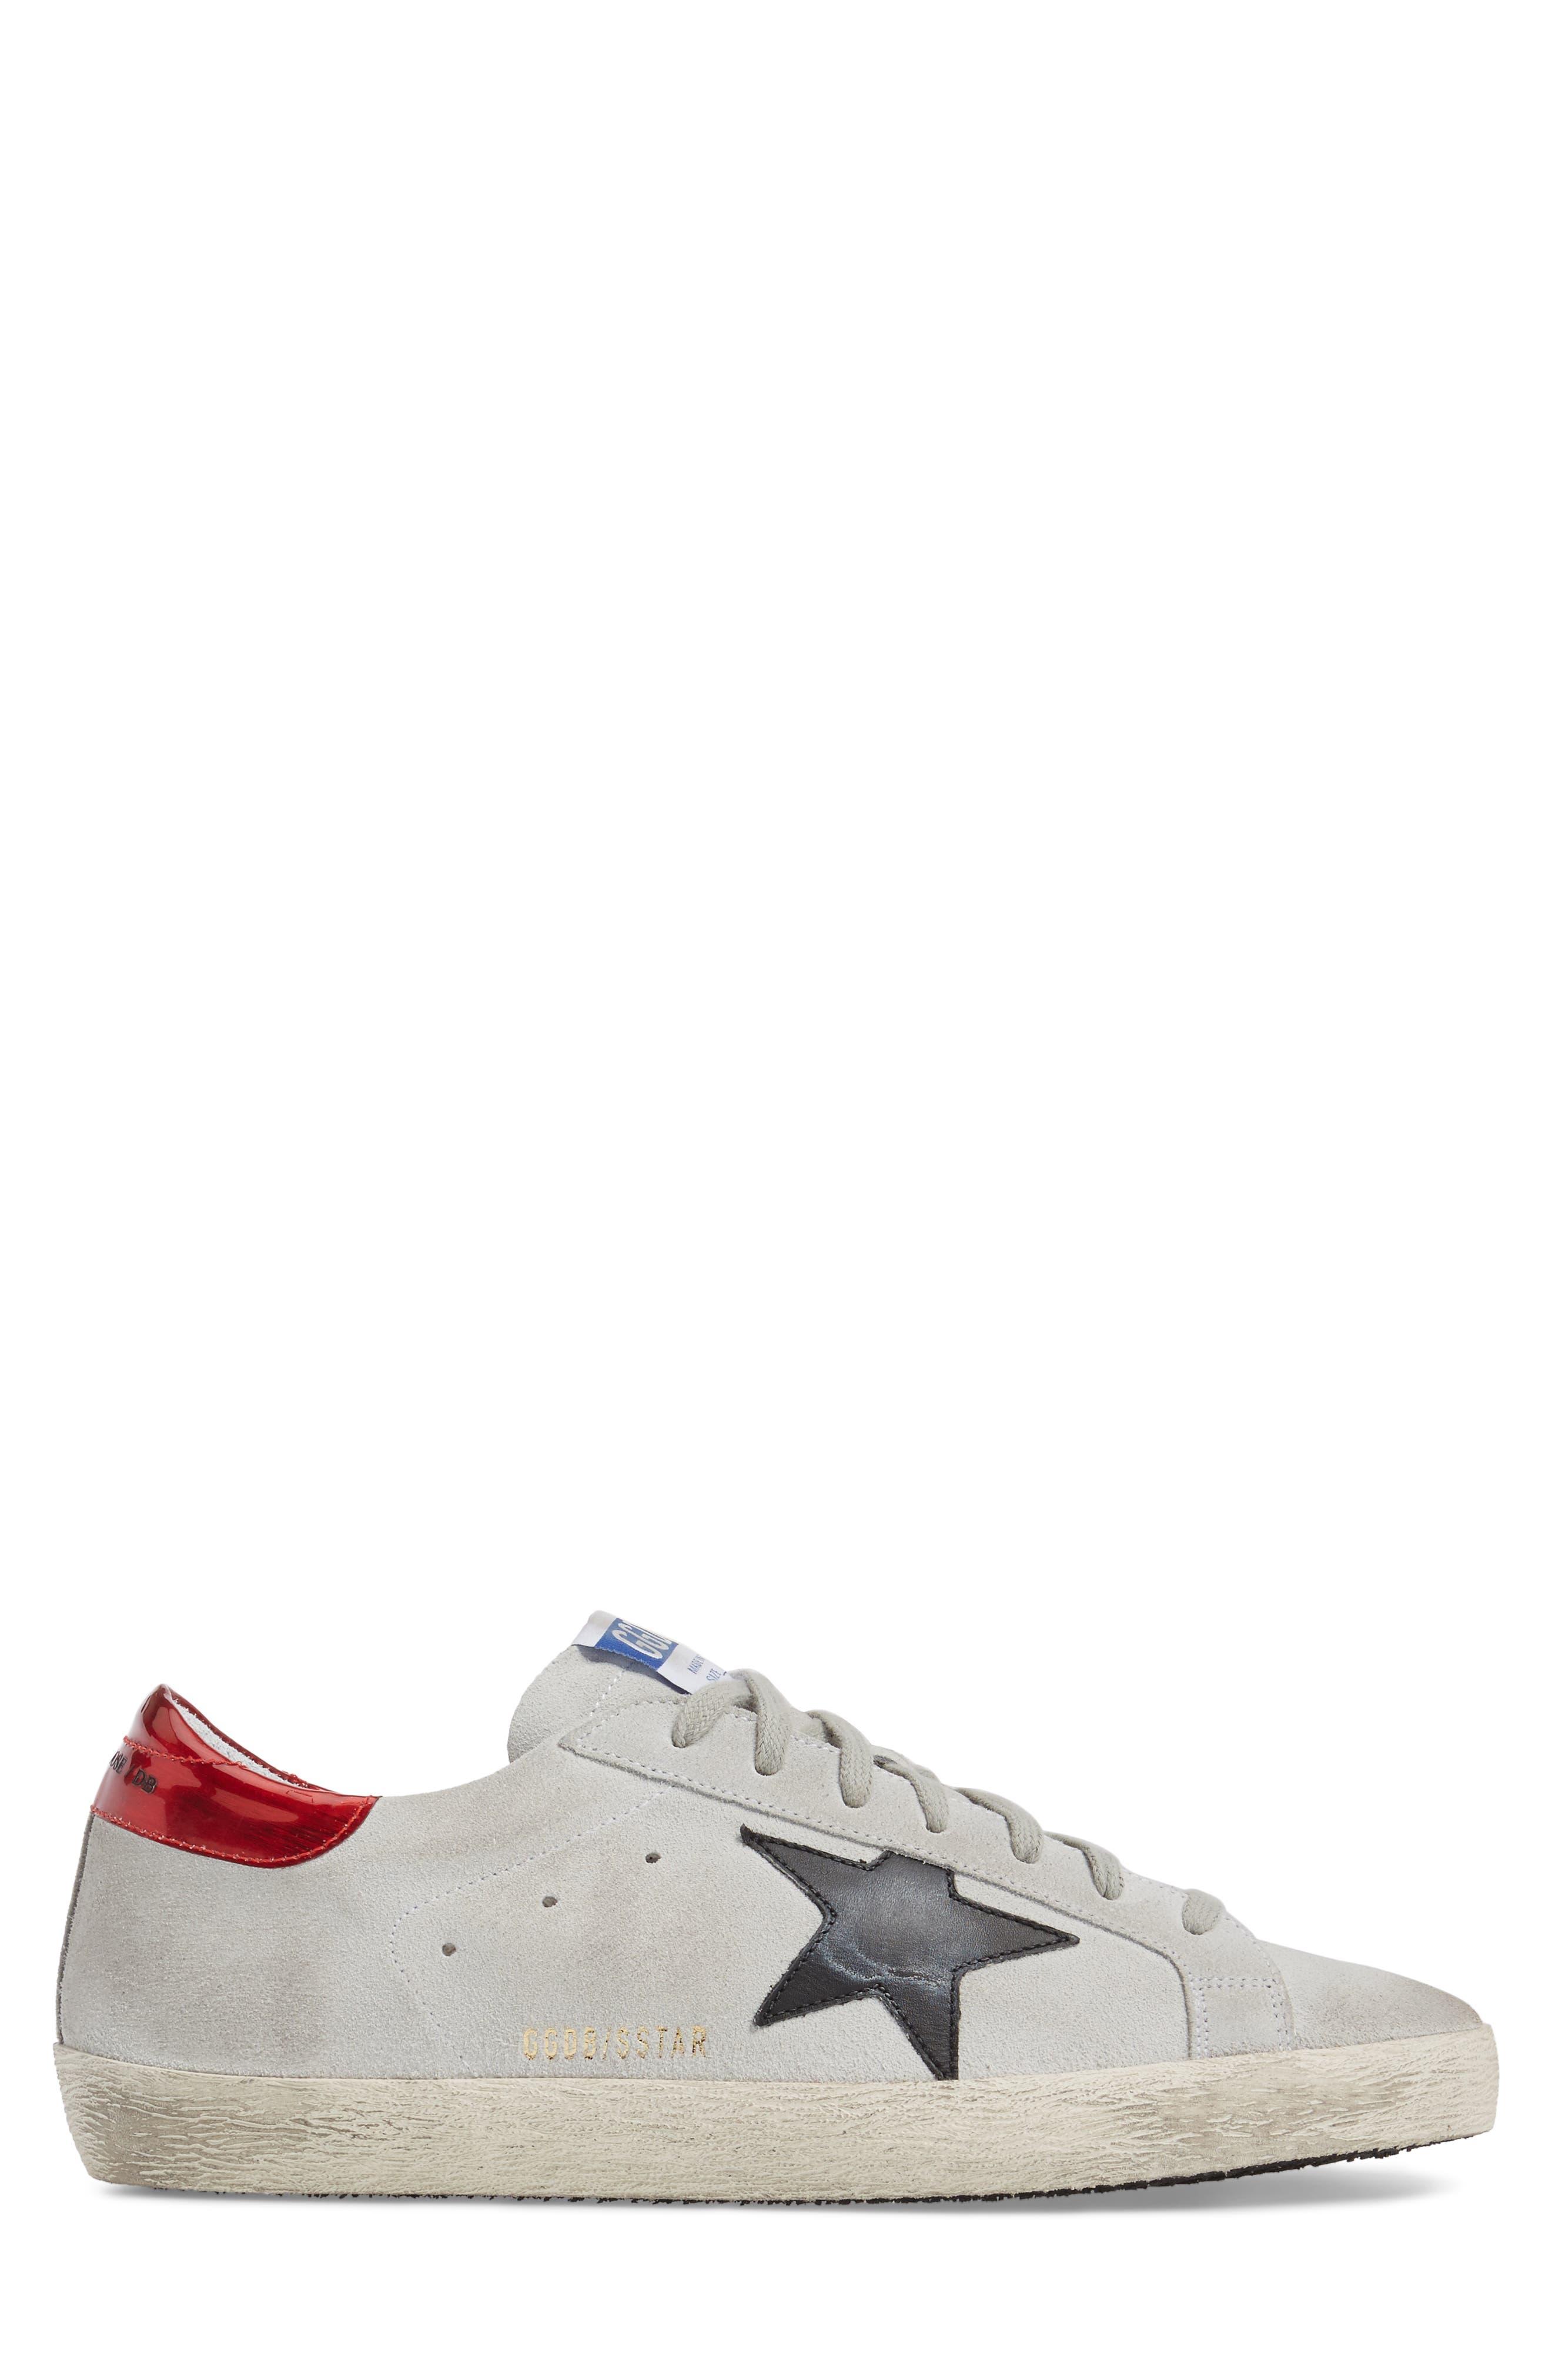 Alternate Image 3  - Golden Goose 'Superstar' Sneaker (Men)